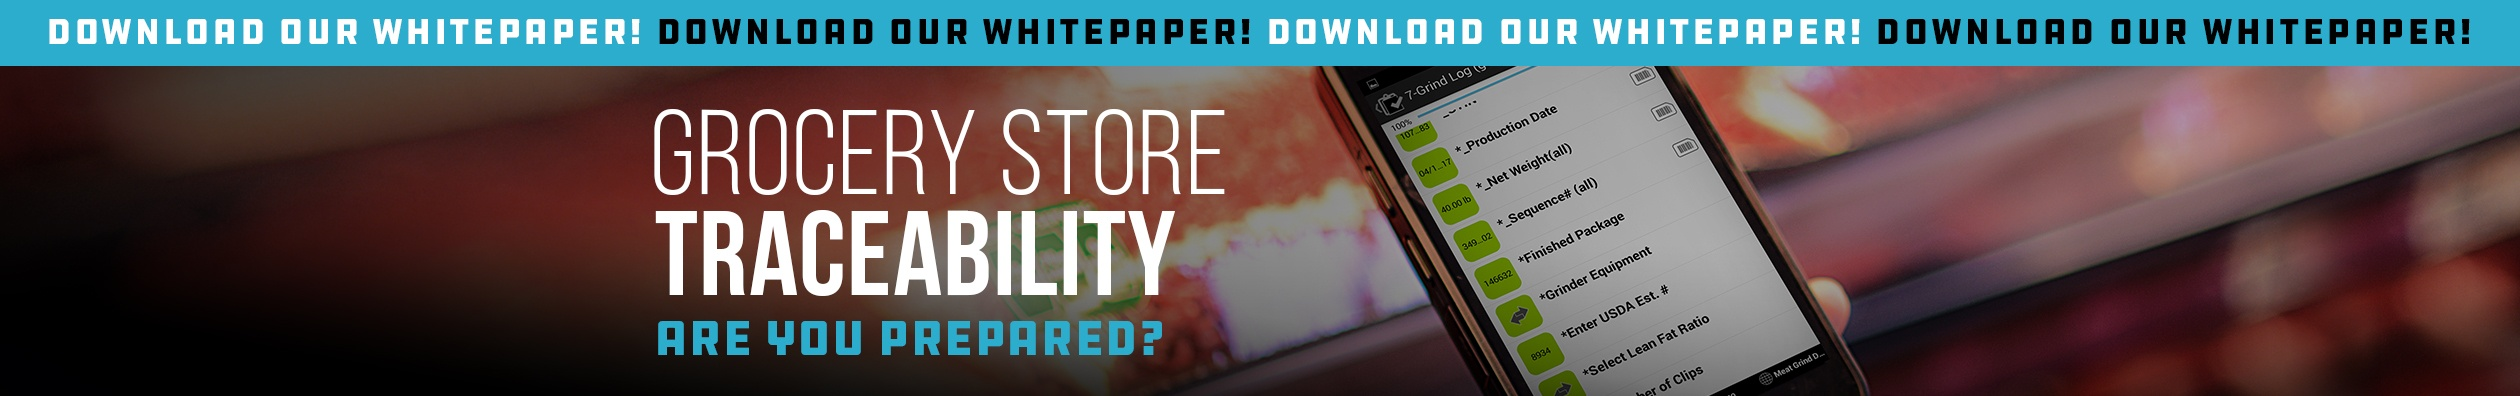 Grocery Traceability LP Header.jpg